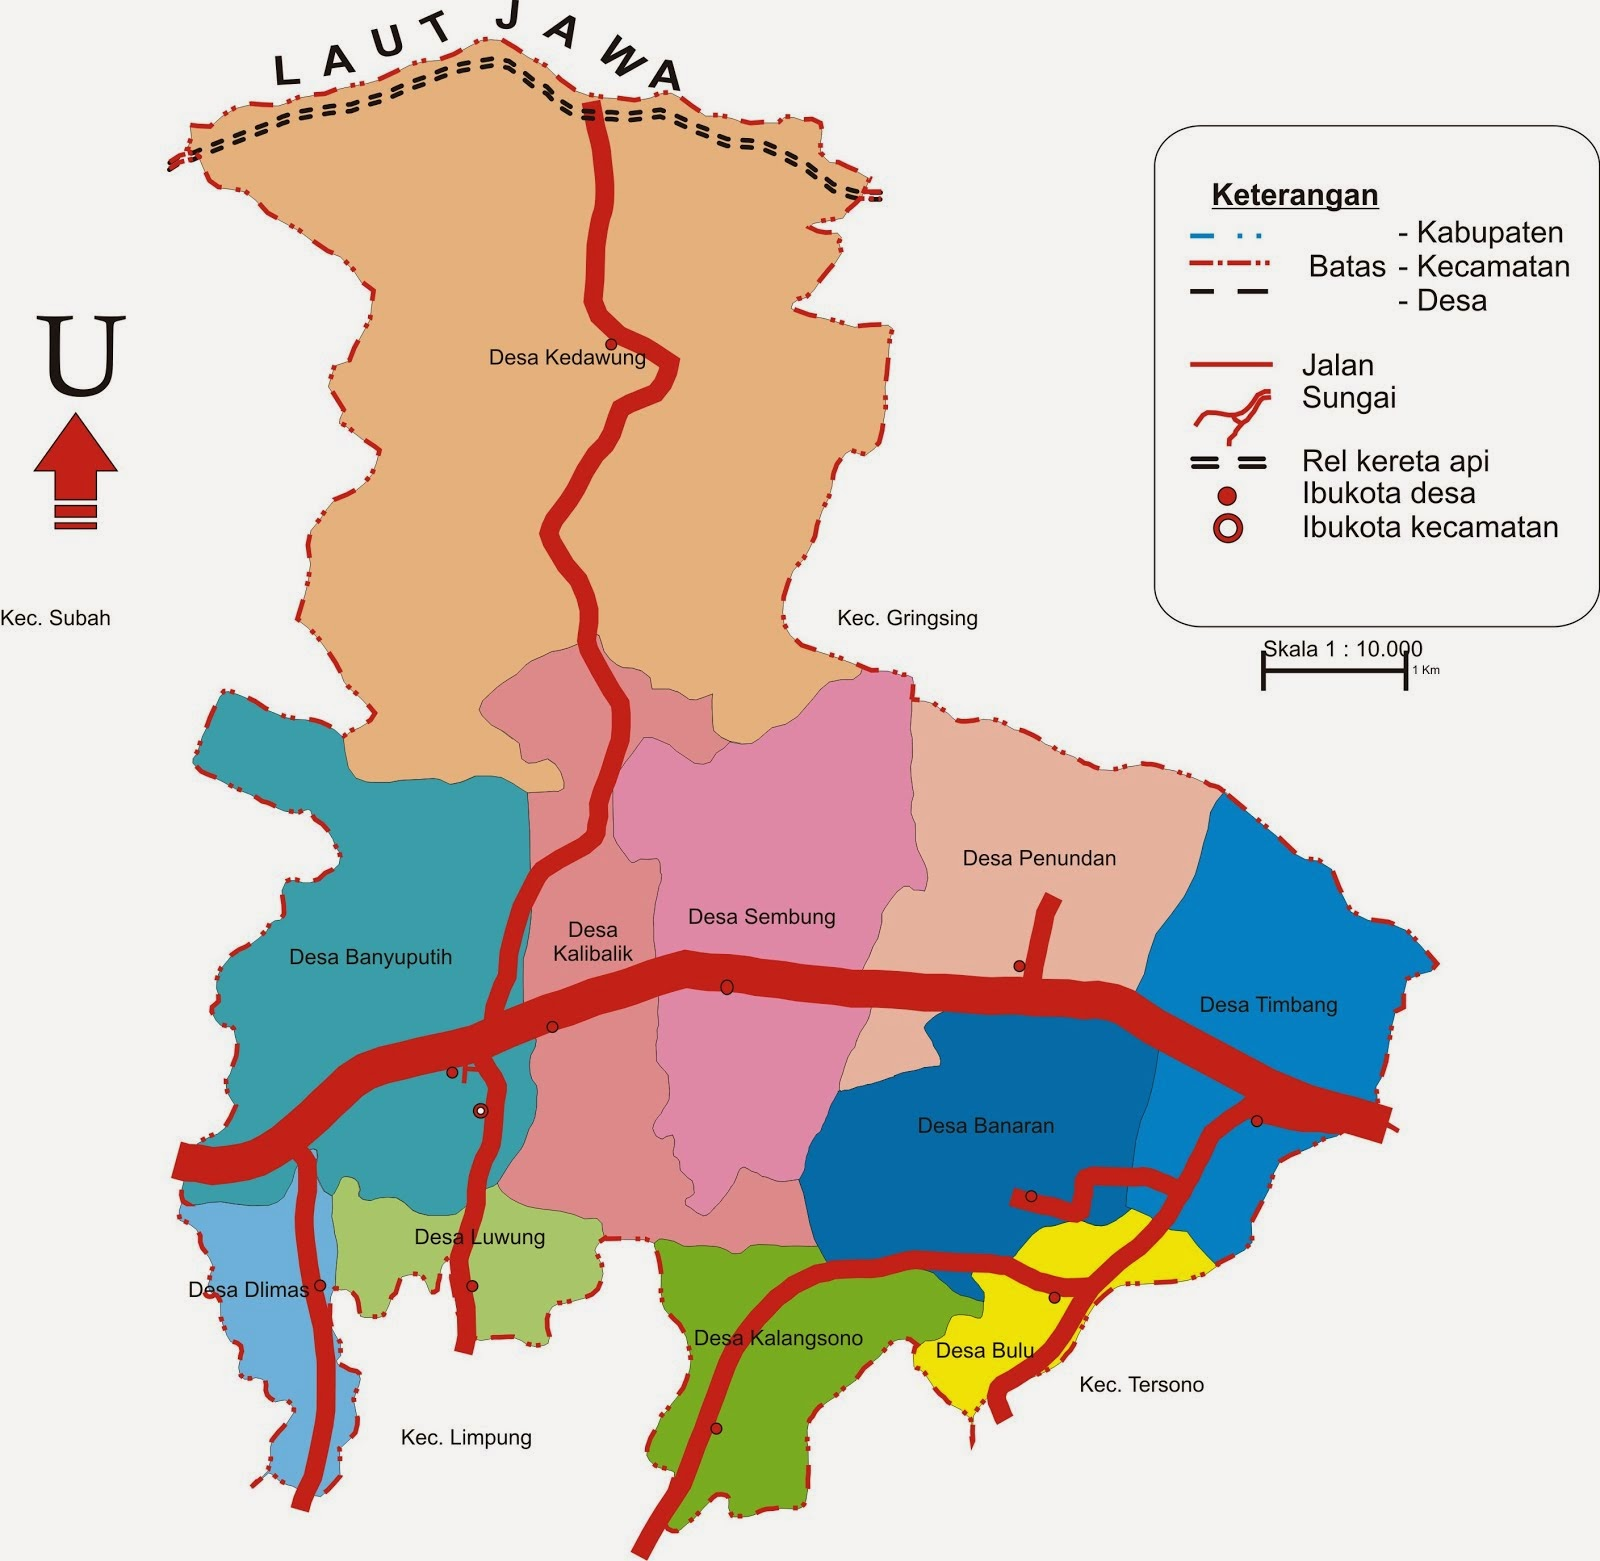 Kanto Kecamatan